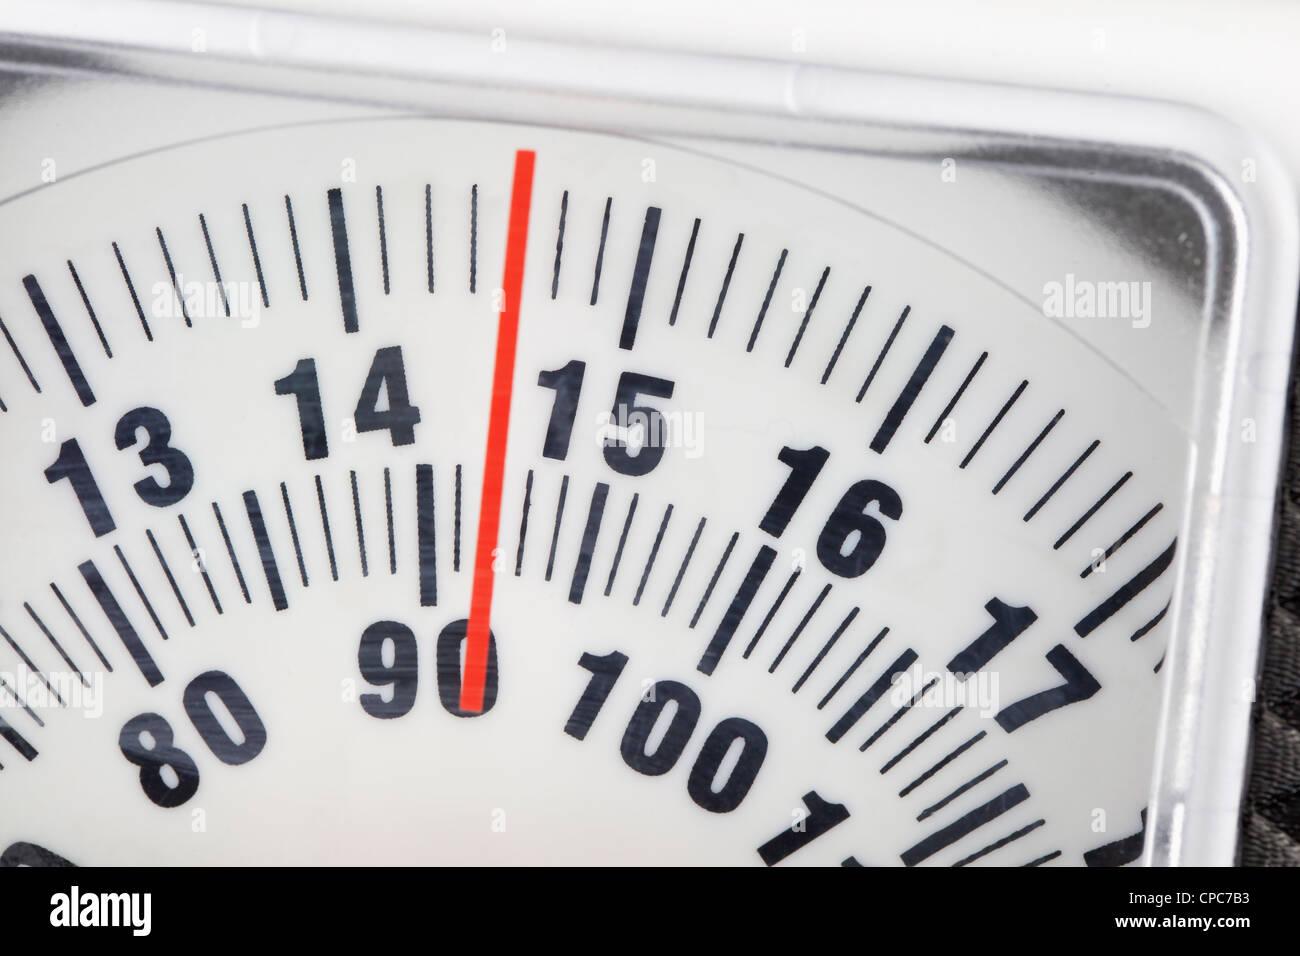 Bathroom scale indicating 92 kilograms - Stock Image